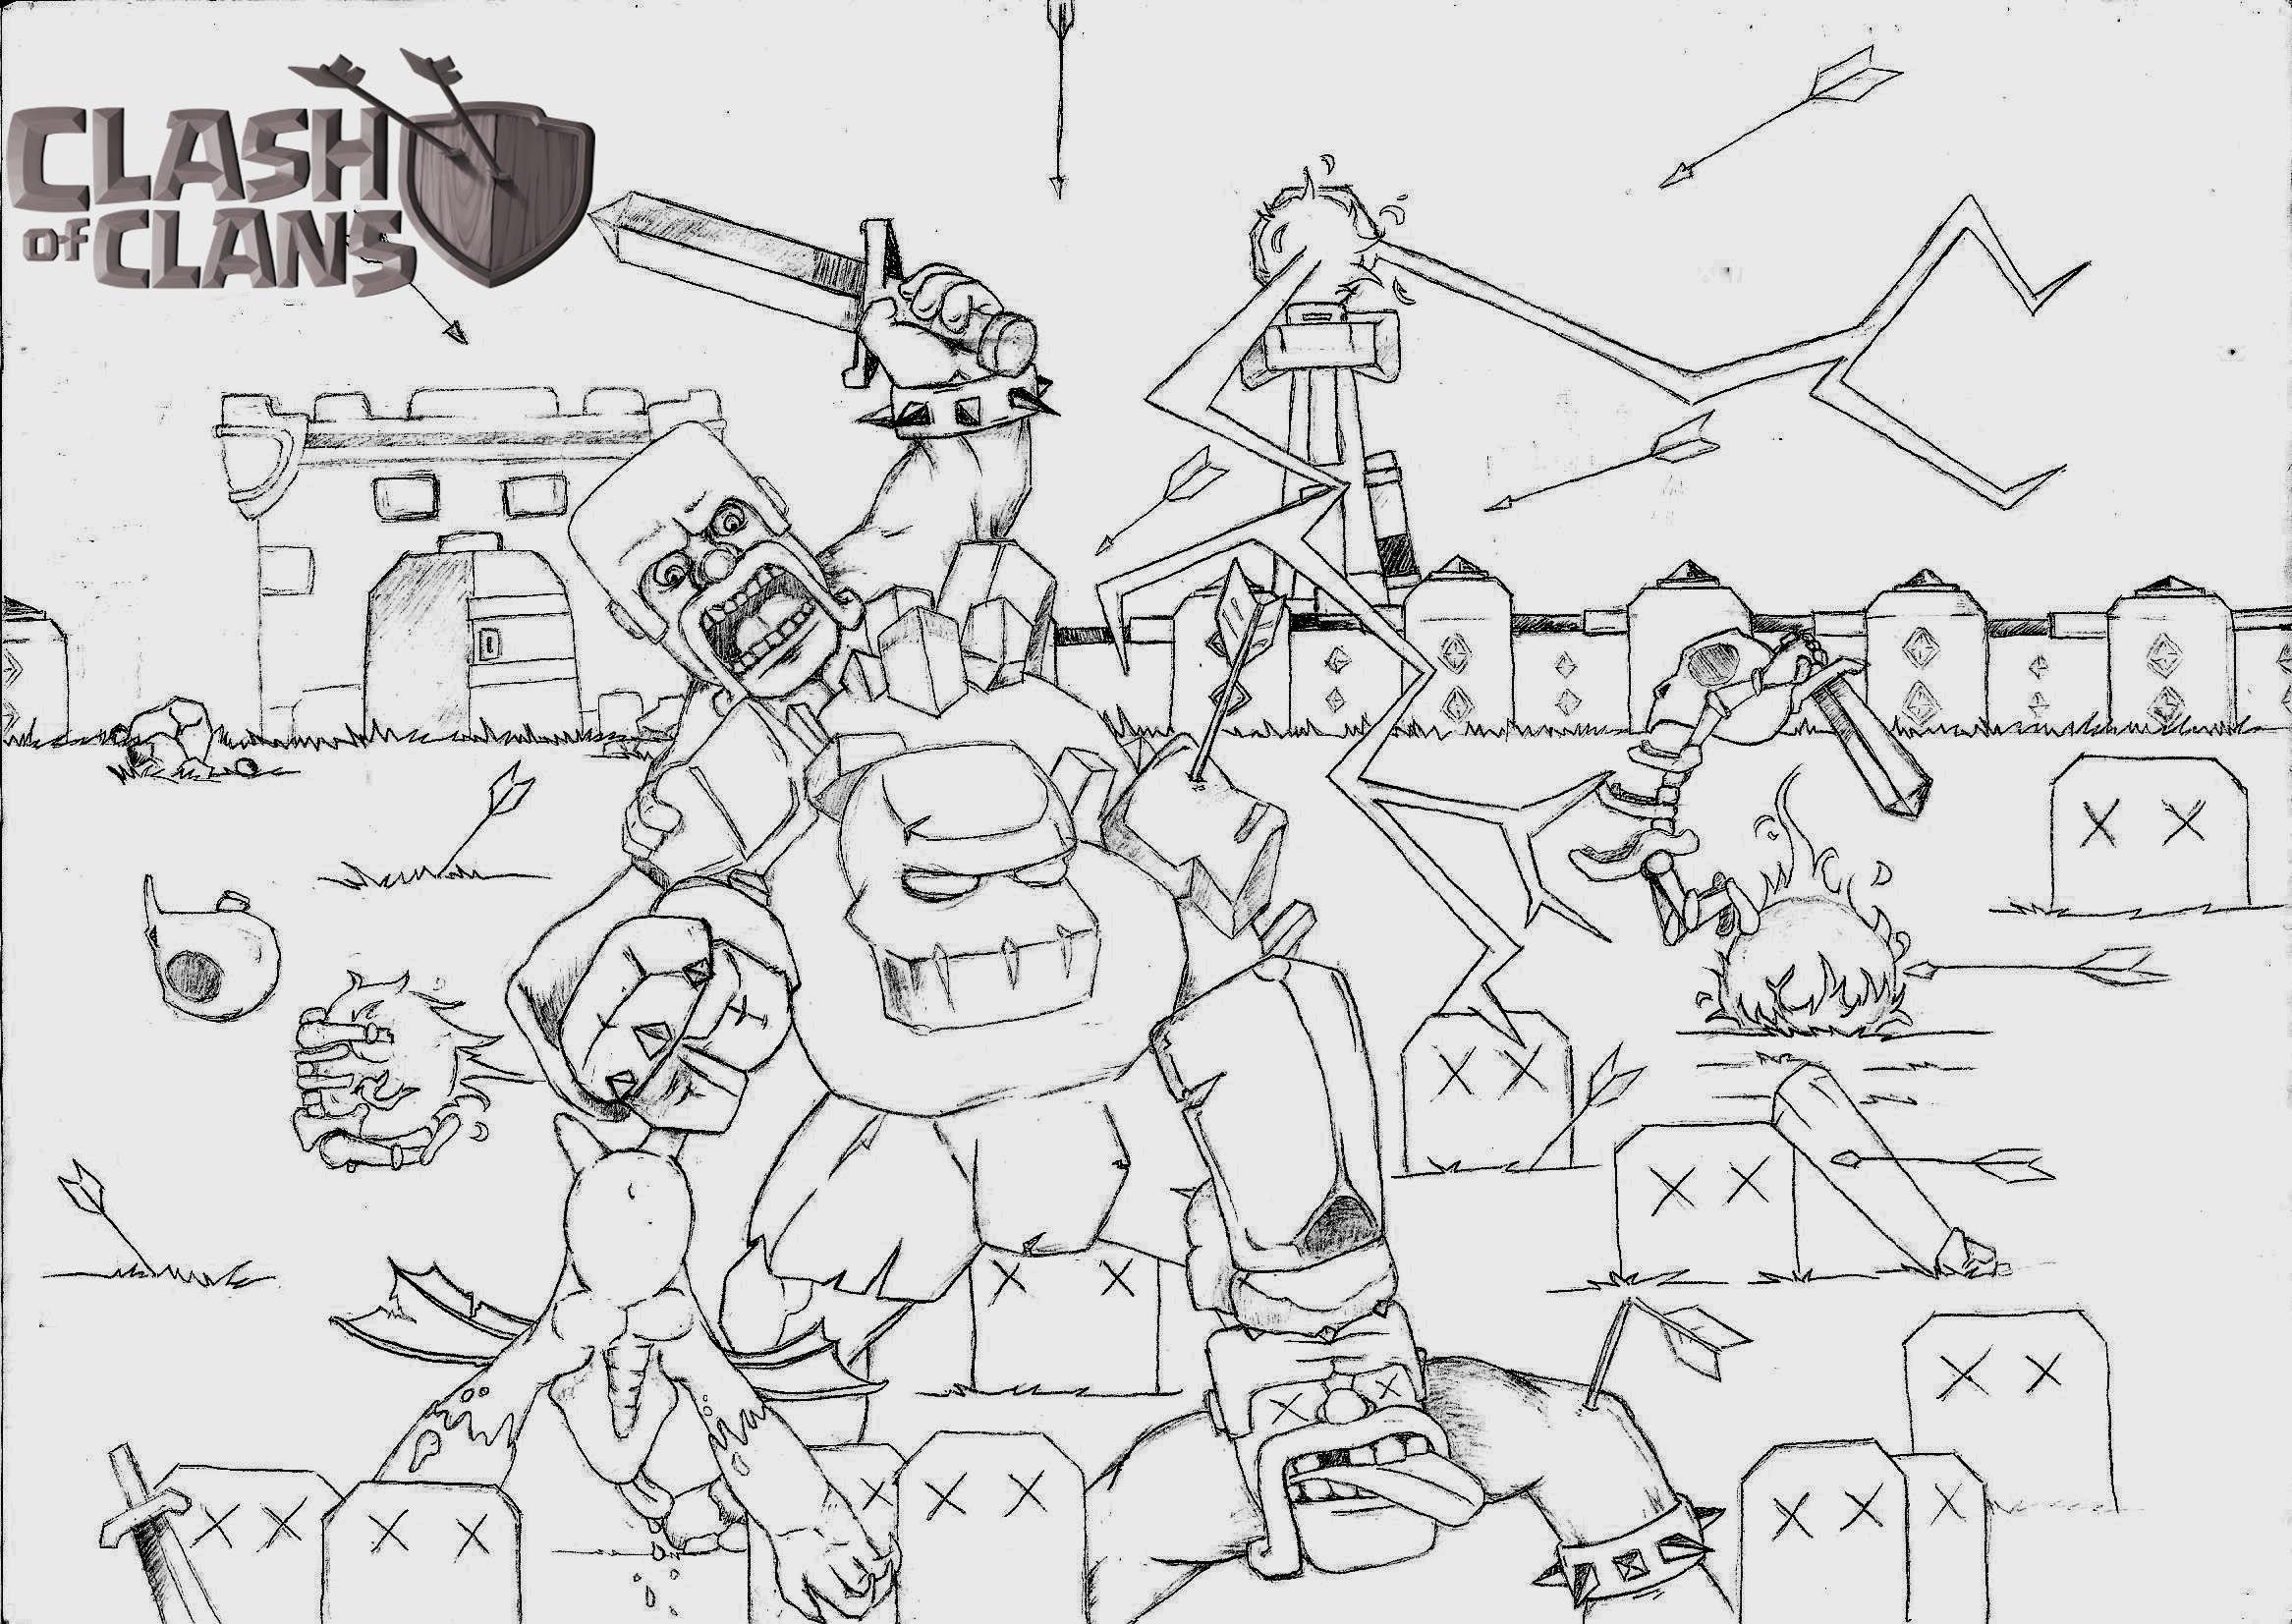 Dibujospara Colorear Clash Royale: Clash Of Clans Coloring Pages